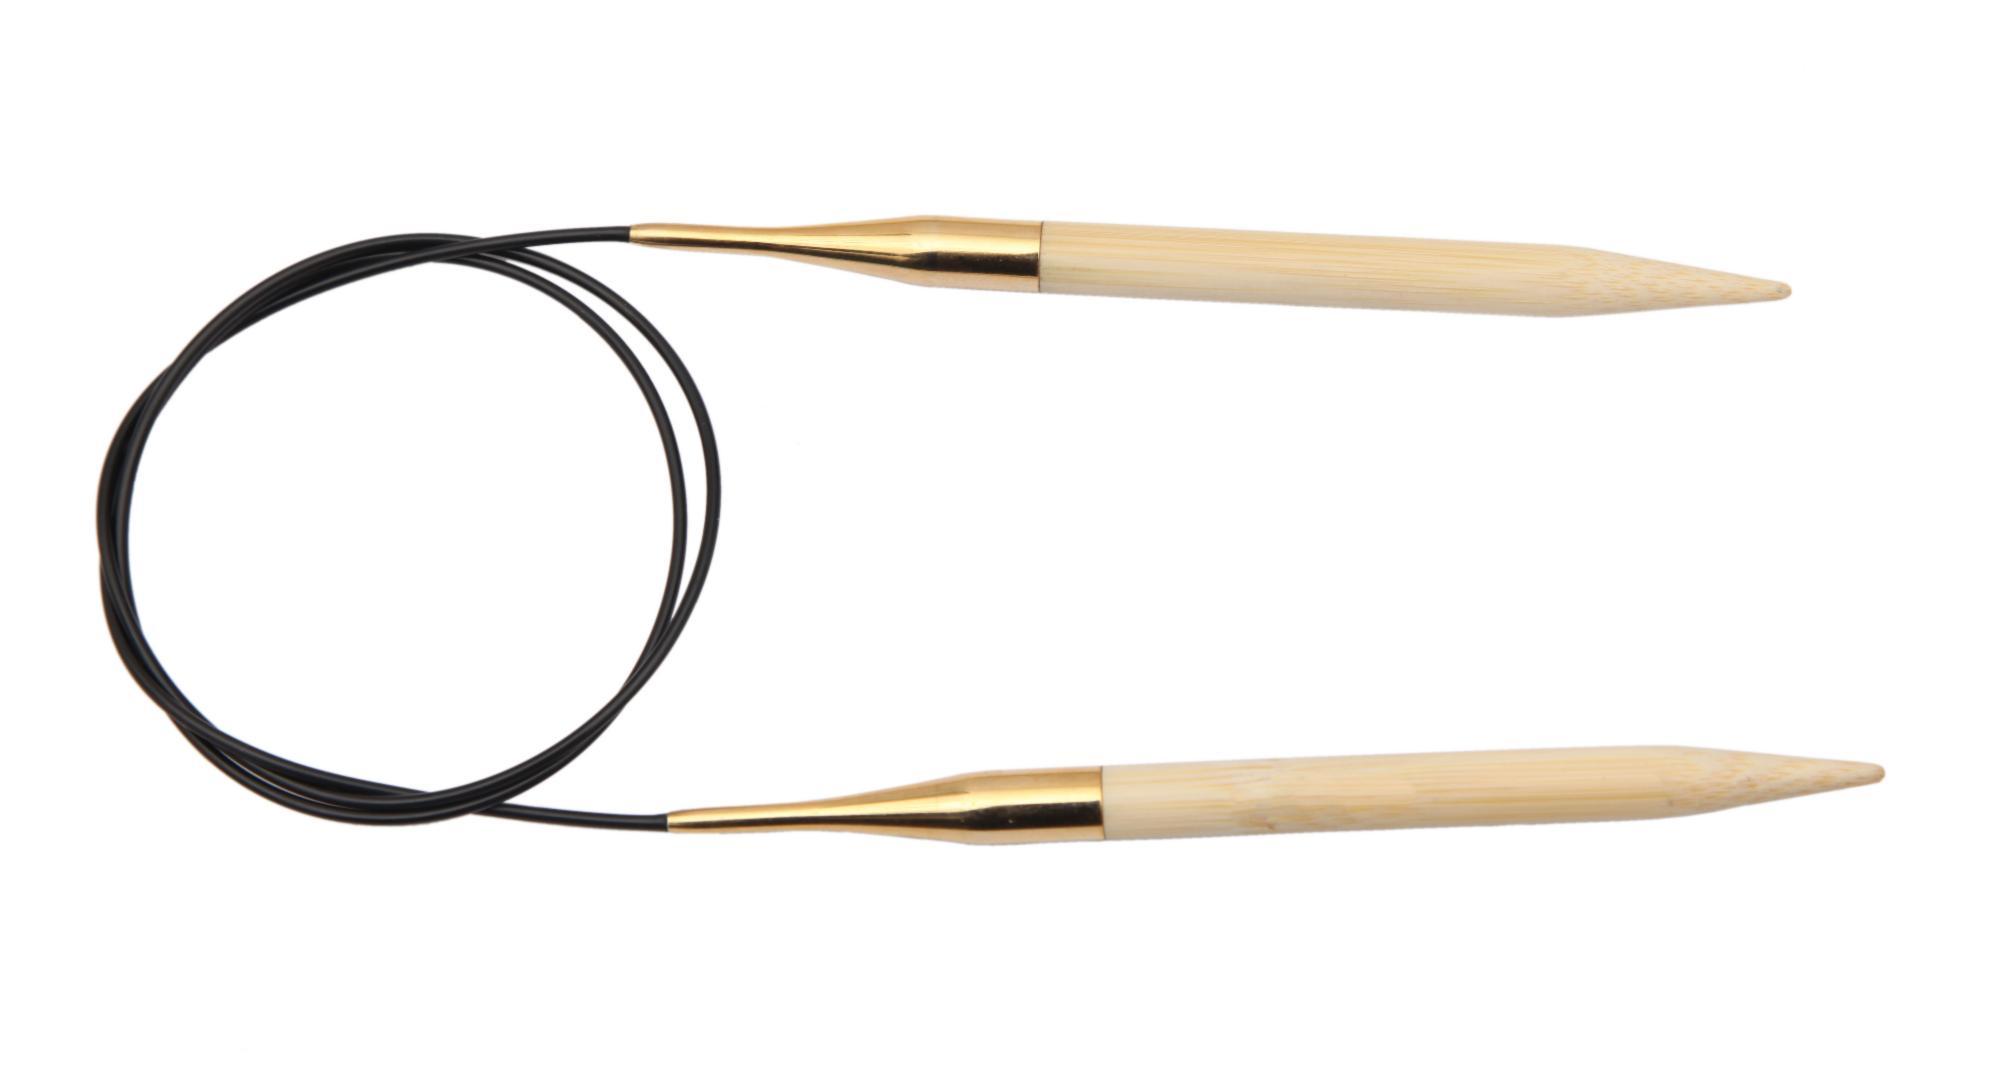 Спицы круговые 60 см Bamboo KnitPro, 22221, 2.00 мм